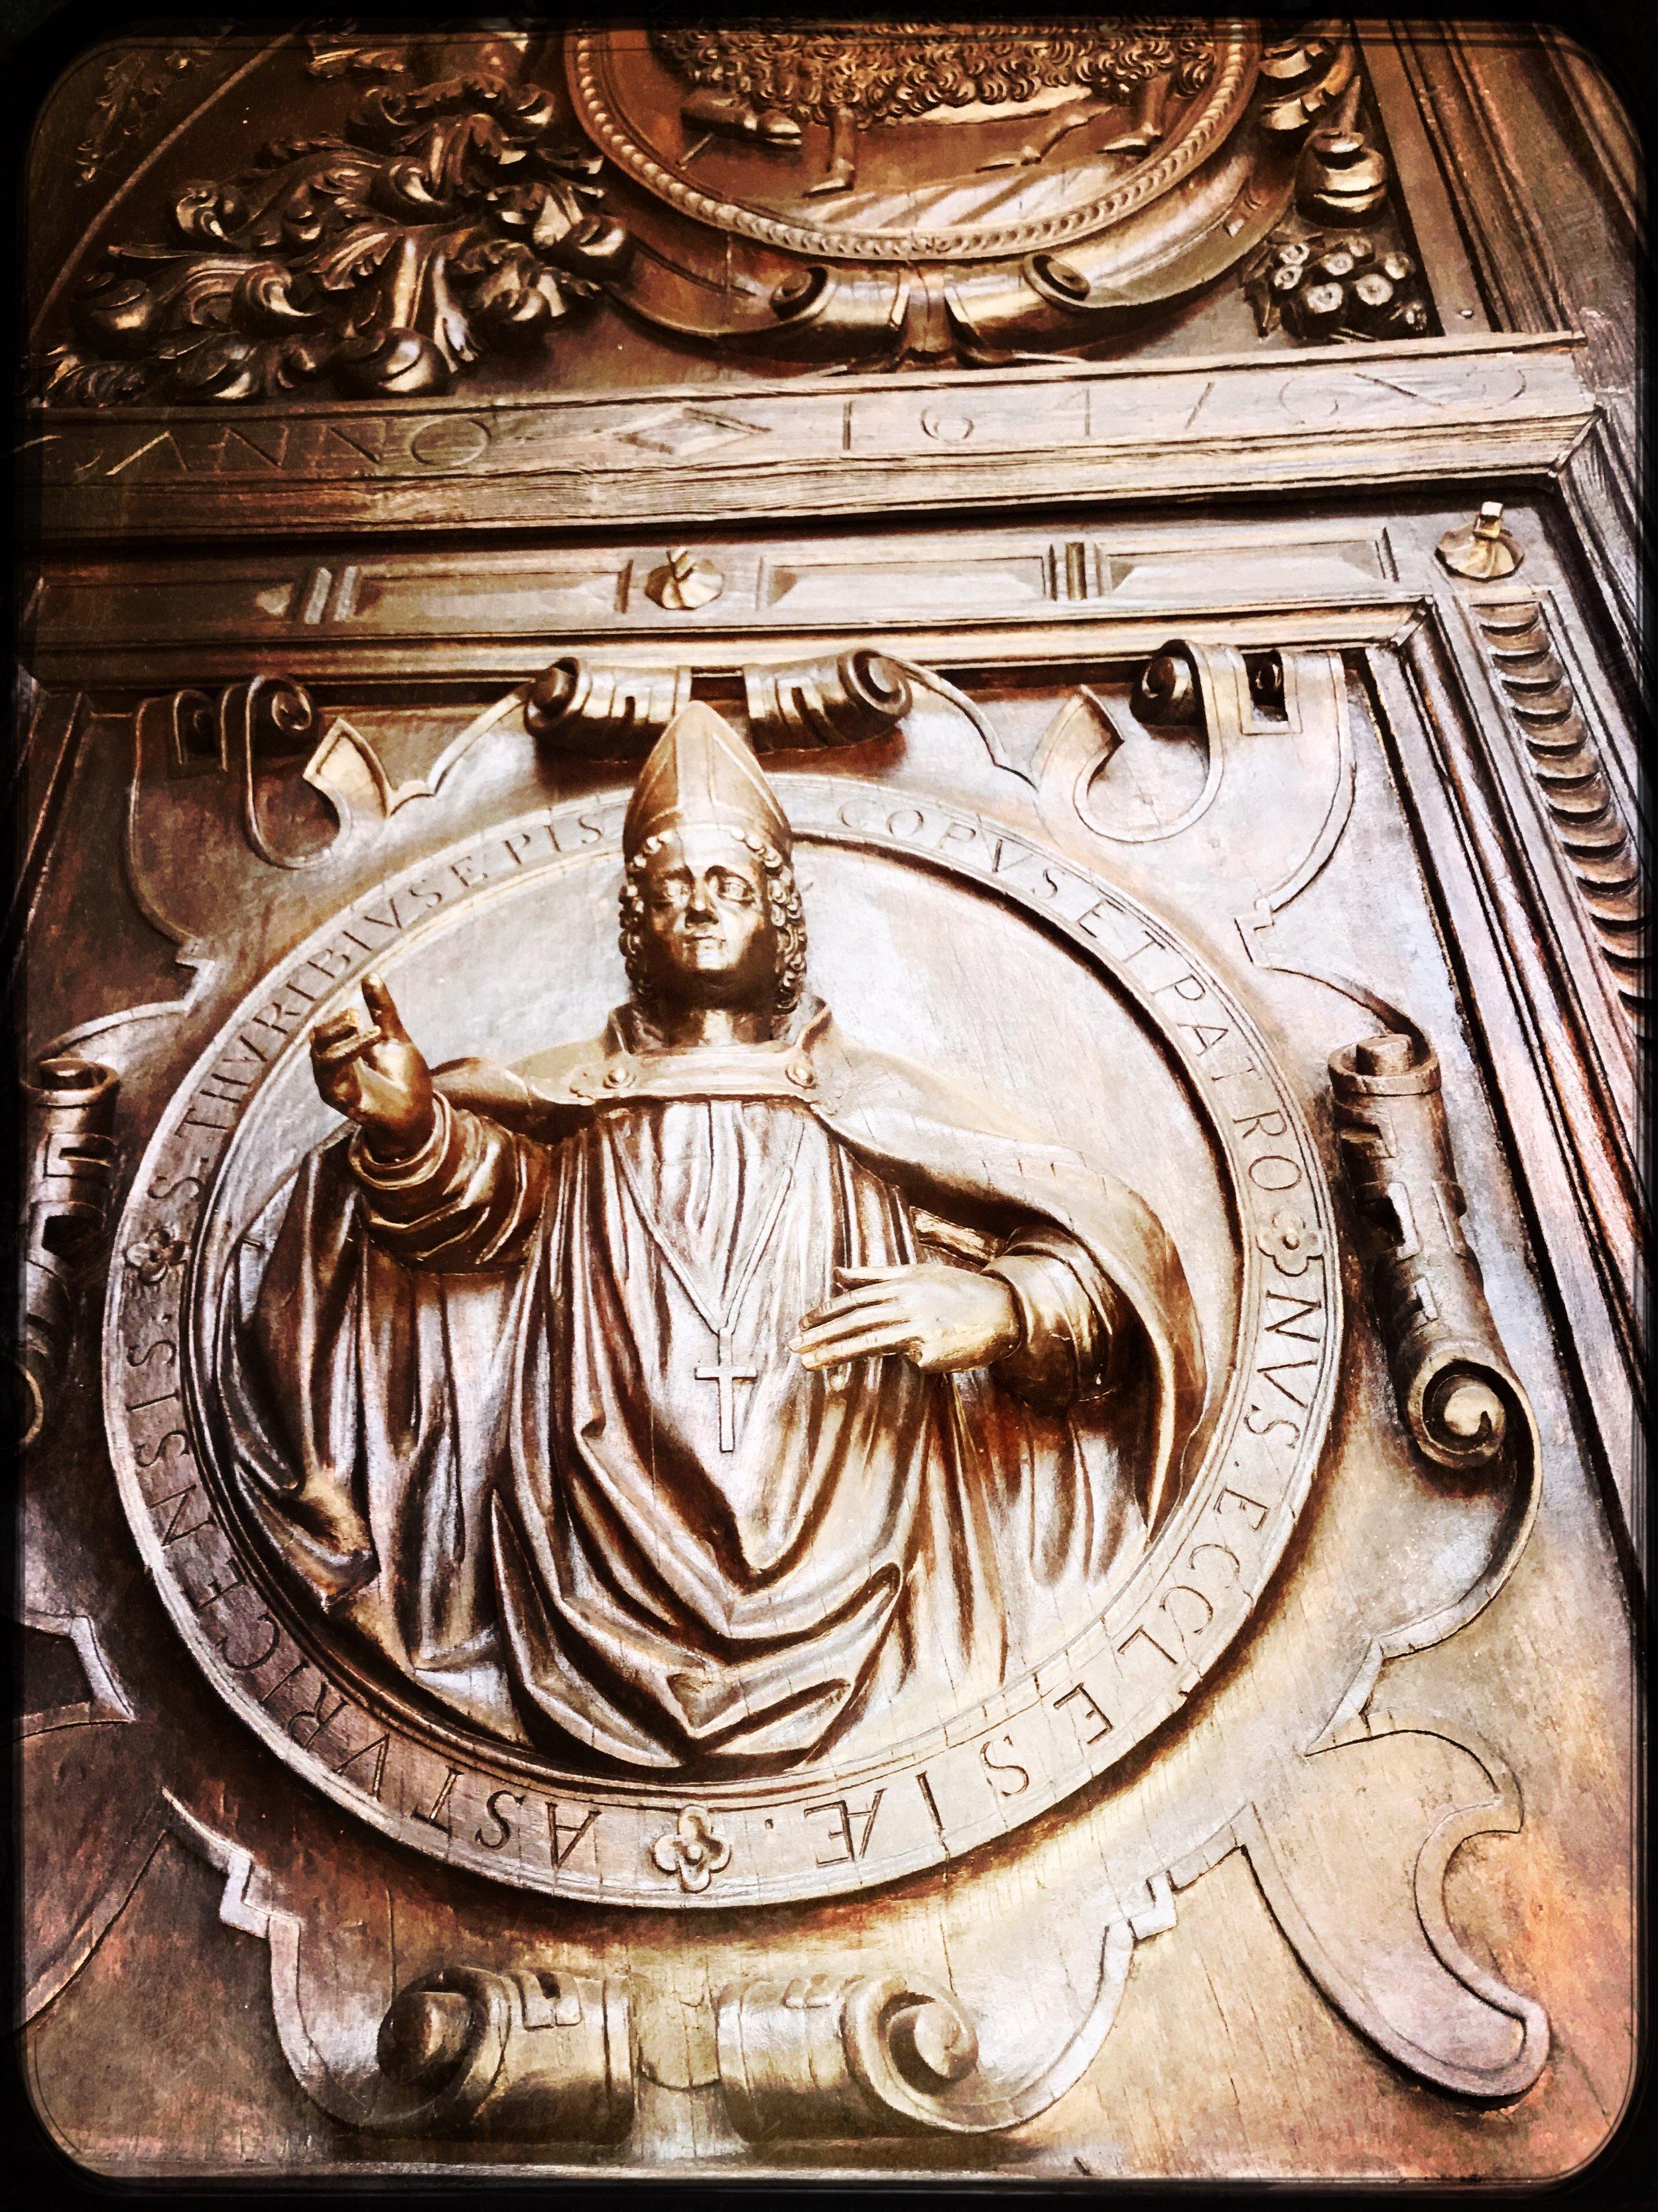 The opulence of Santiago de Compostela